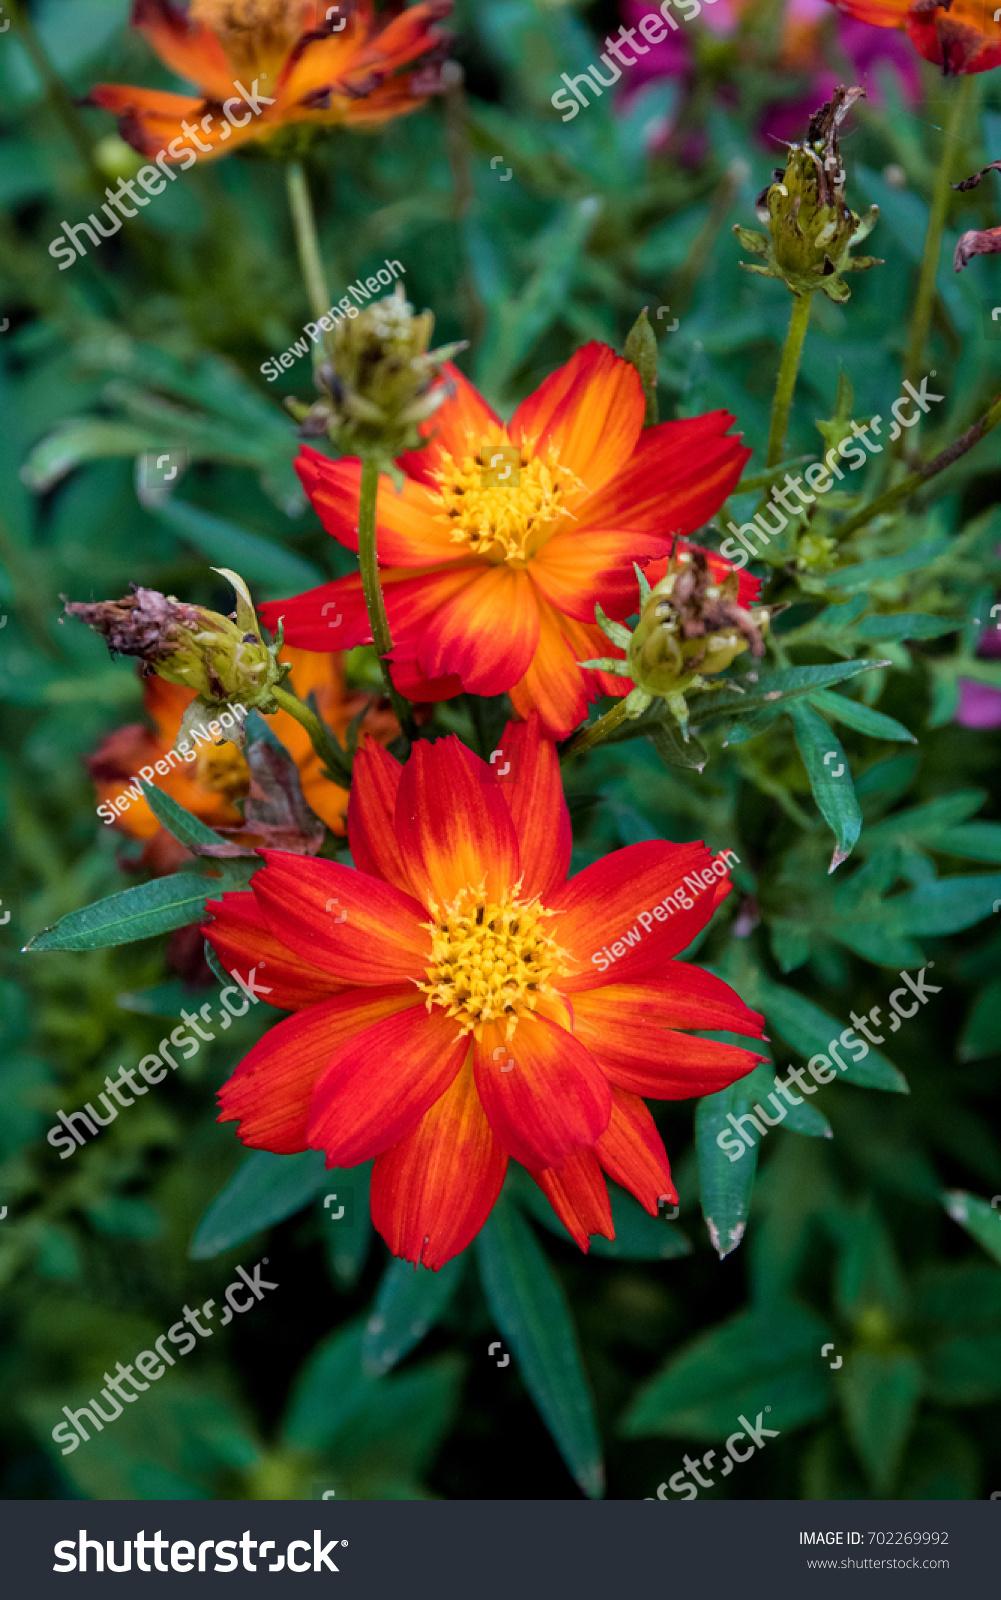 Marigolds Tagetes Flowers Yellow Or Orange Garden Flowerbed